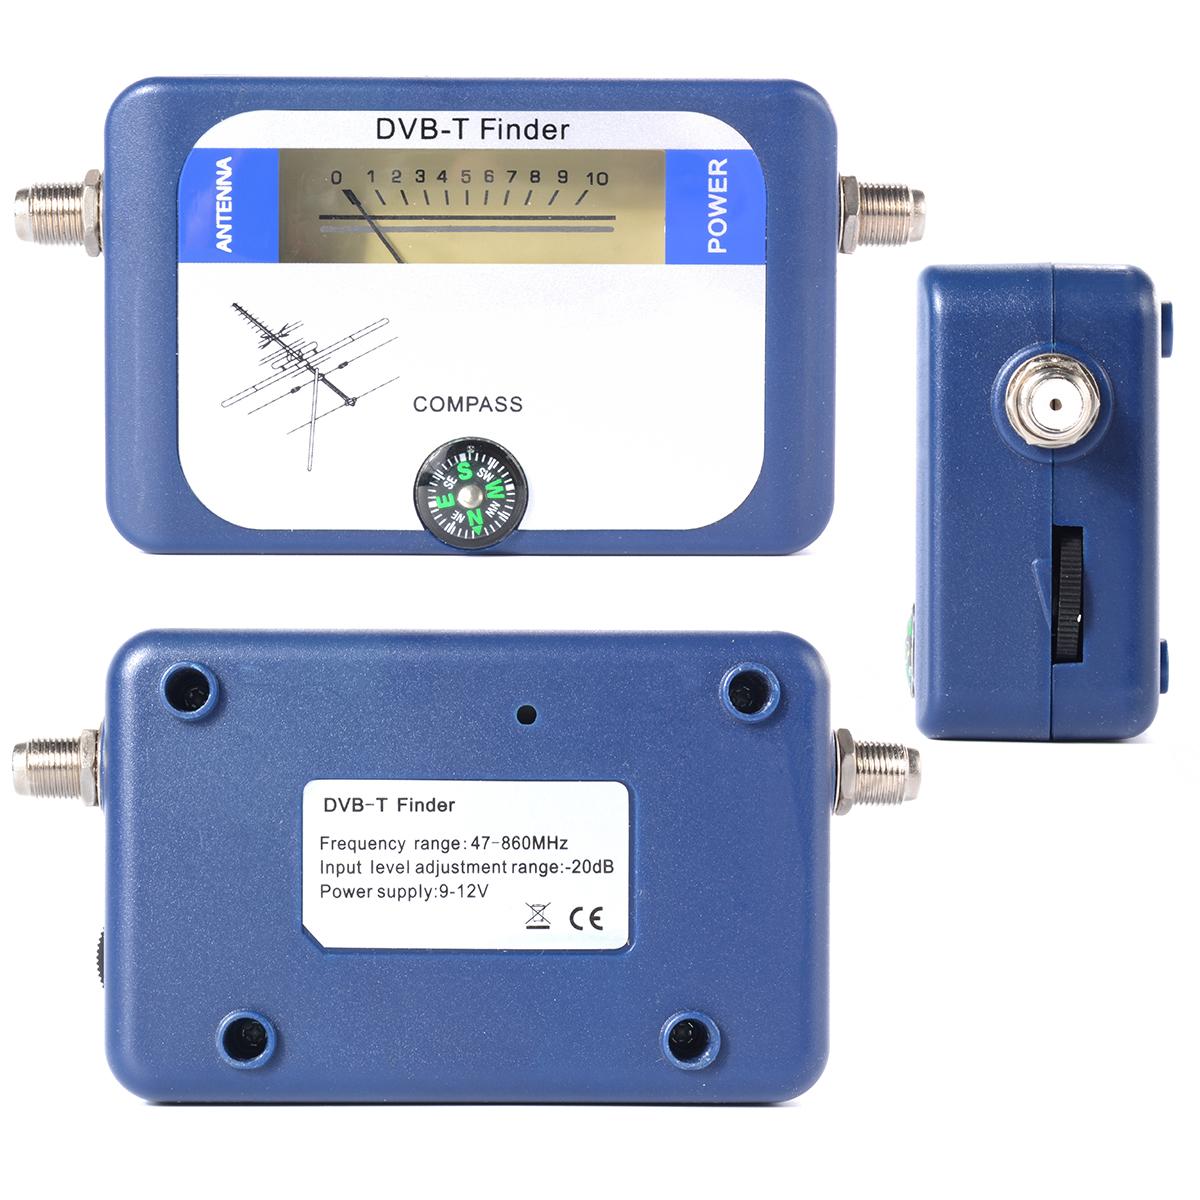 DVB-T satellite receiver Finder Meter LCD Display TV Signal Finder Aerial Terrestrial Signal Strength Meter BI018(China (Mainland))